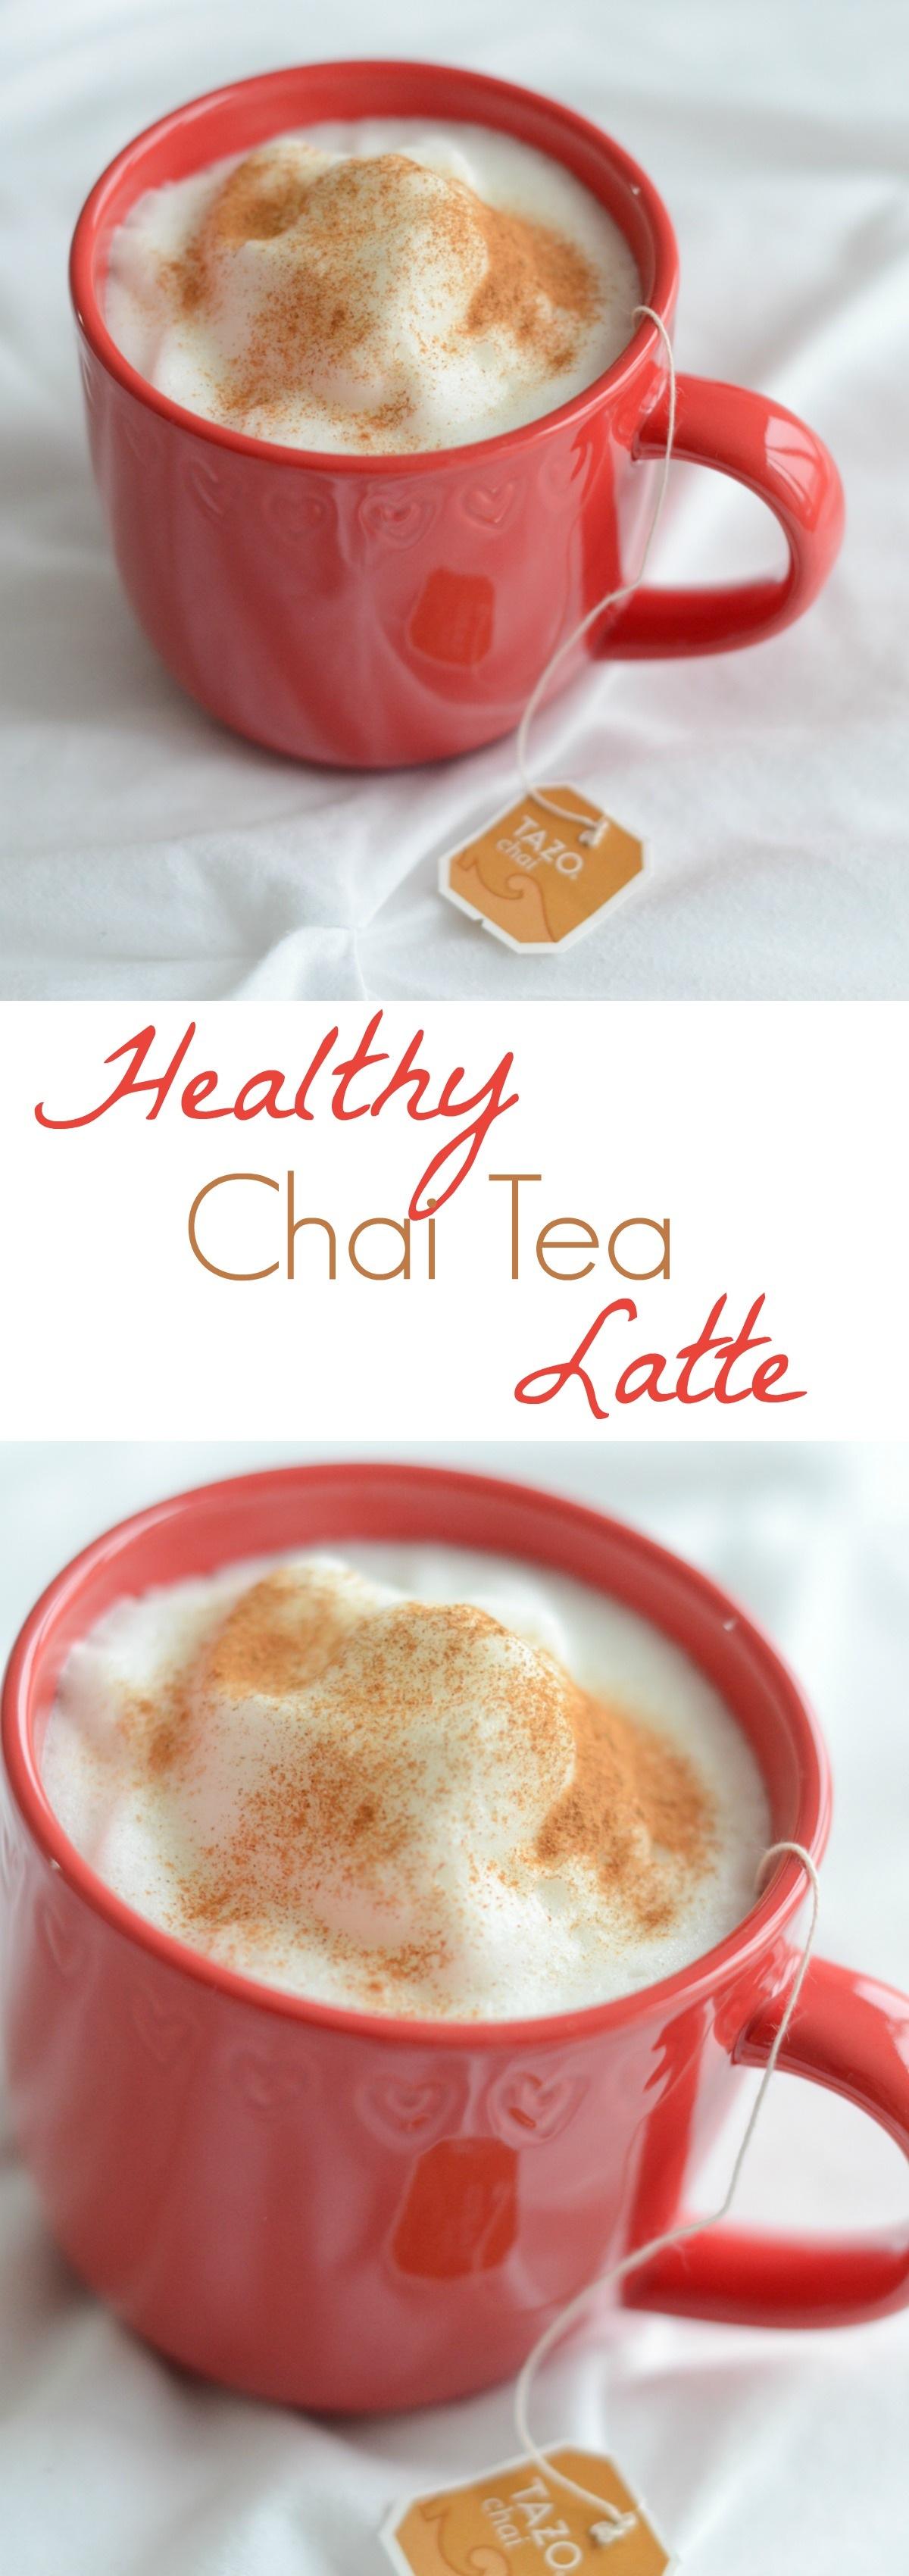 healthy chai tea latte recipe the chic life. Black Bedroom Furniture Sets. Home Design Ideas